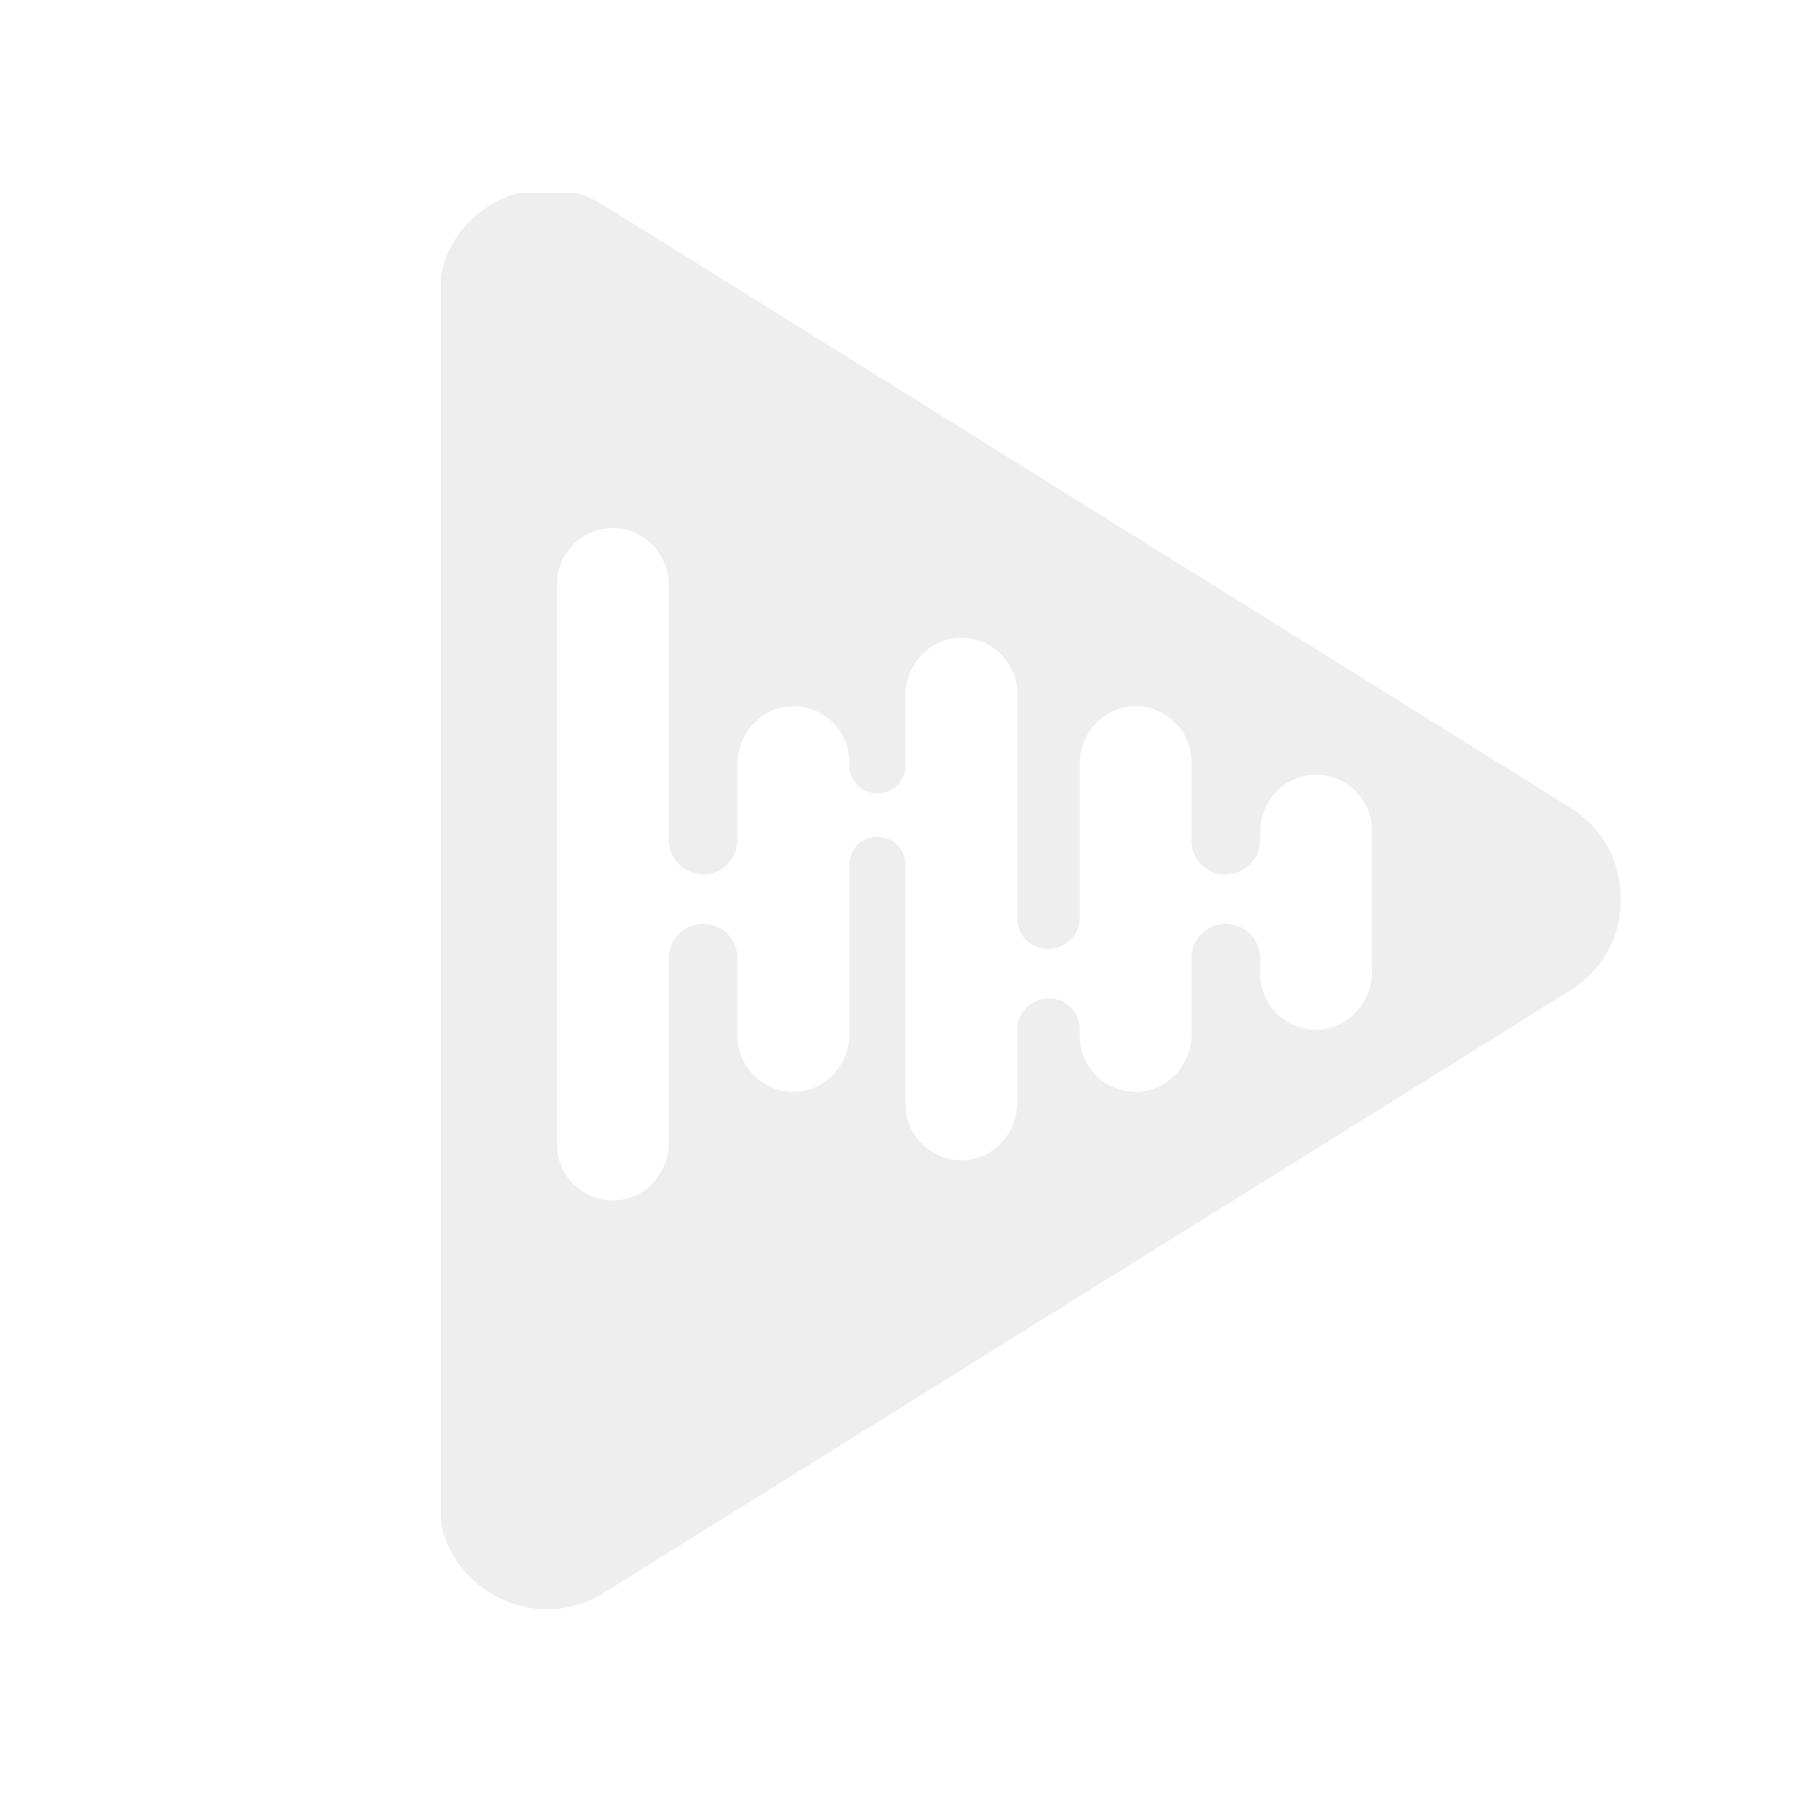 Audison APBMW-E90-HIFI